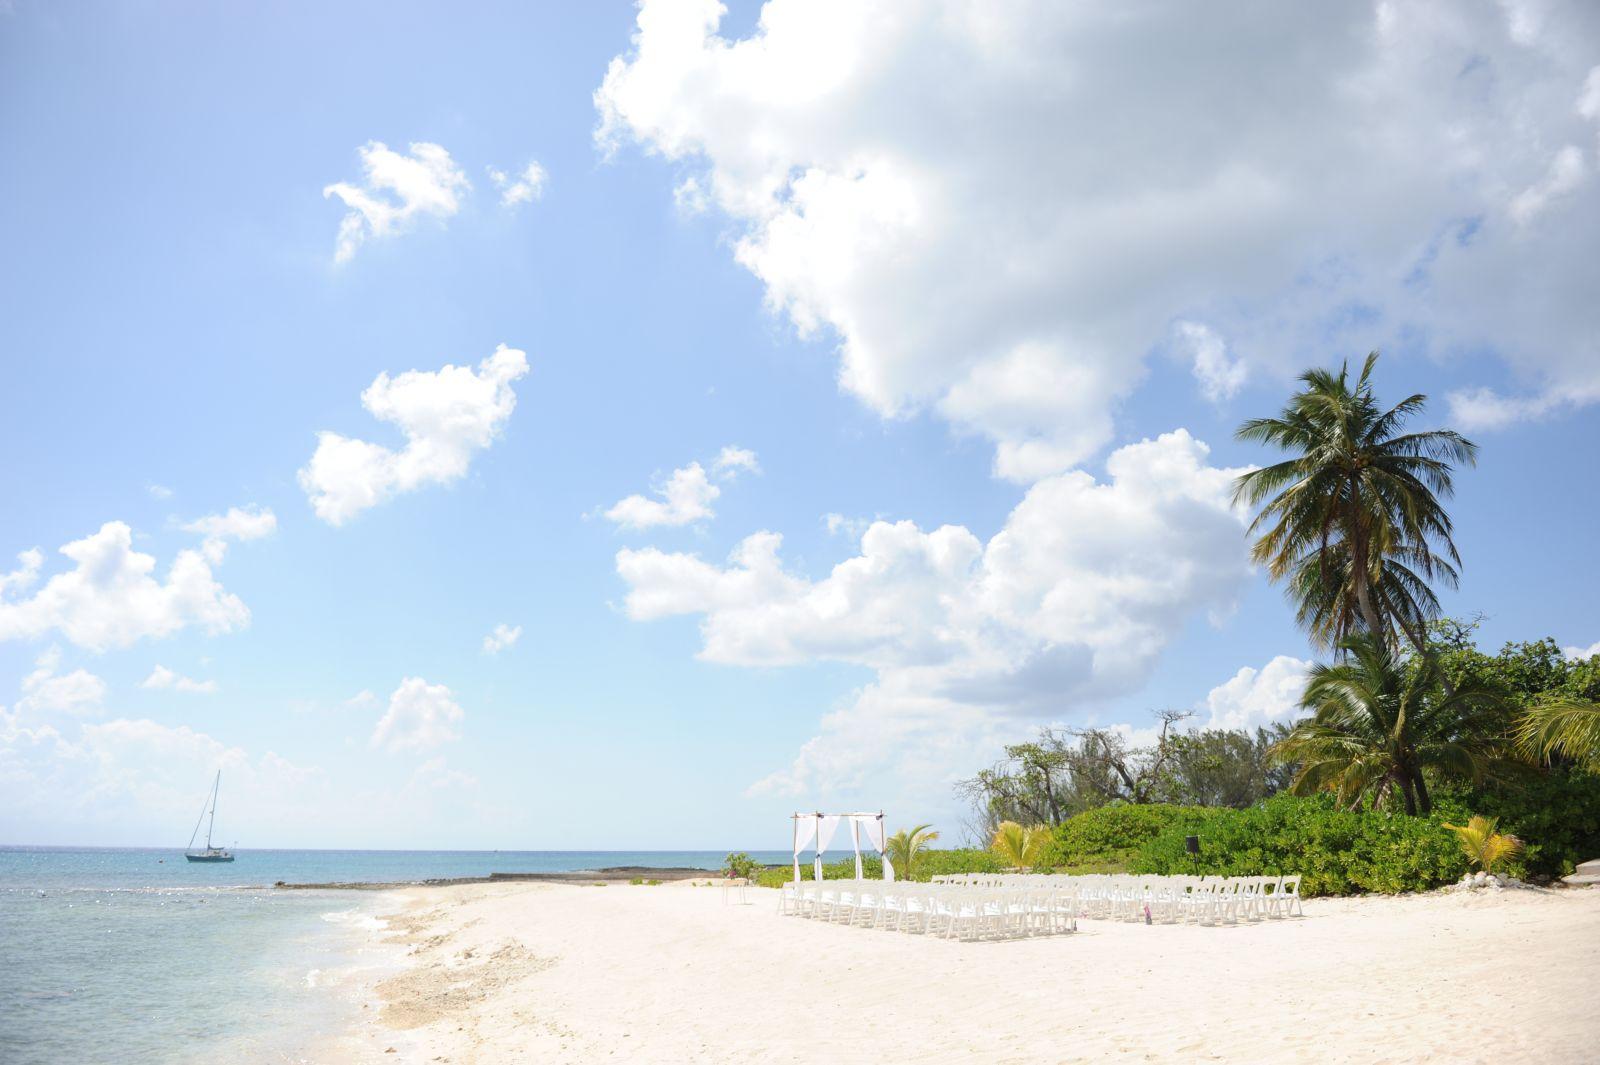 Updated Grand Cayman Weddings Thread